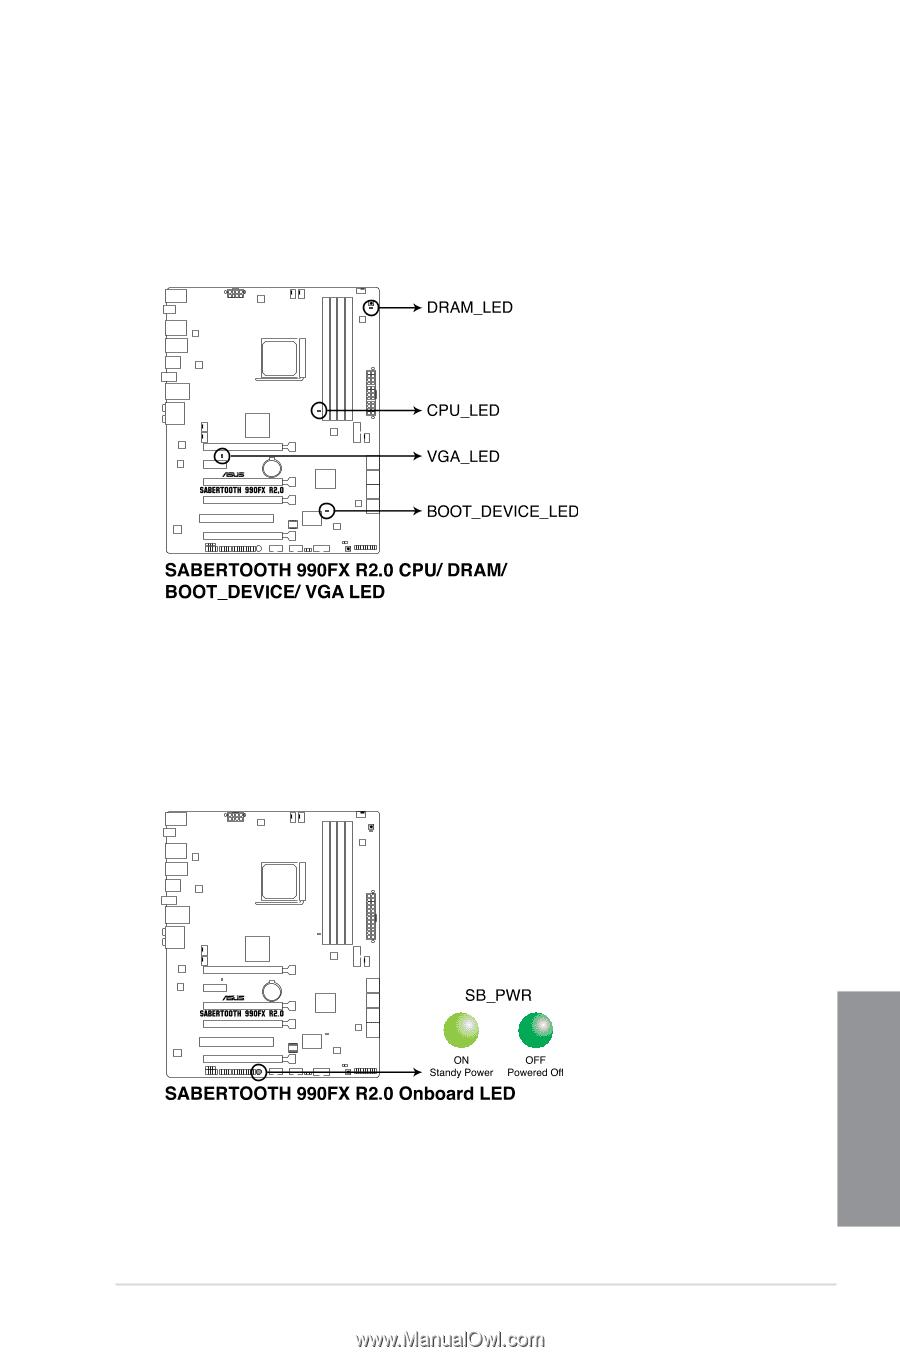 Asus SABERTOOTH 990FX R2 0 | SABERTOOTH 990FX R2 0 User's